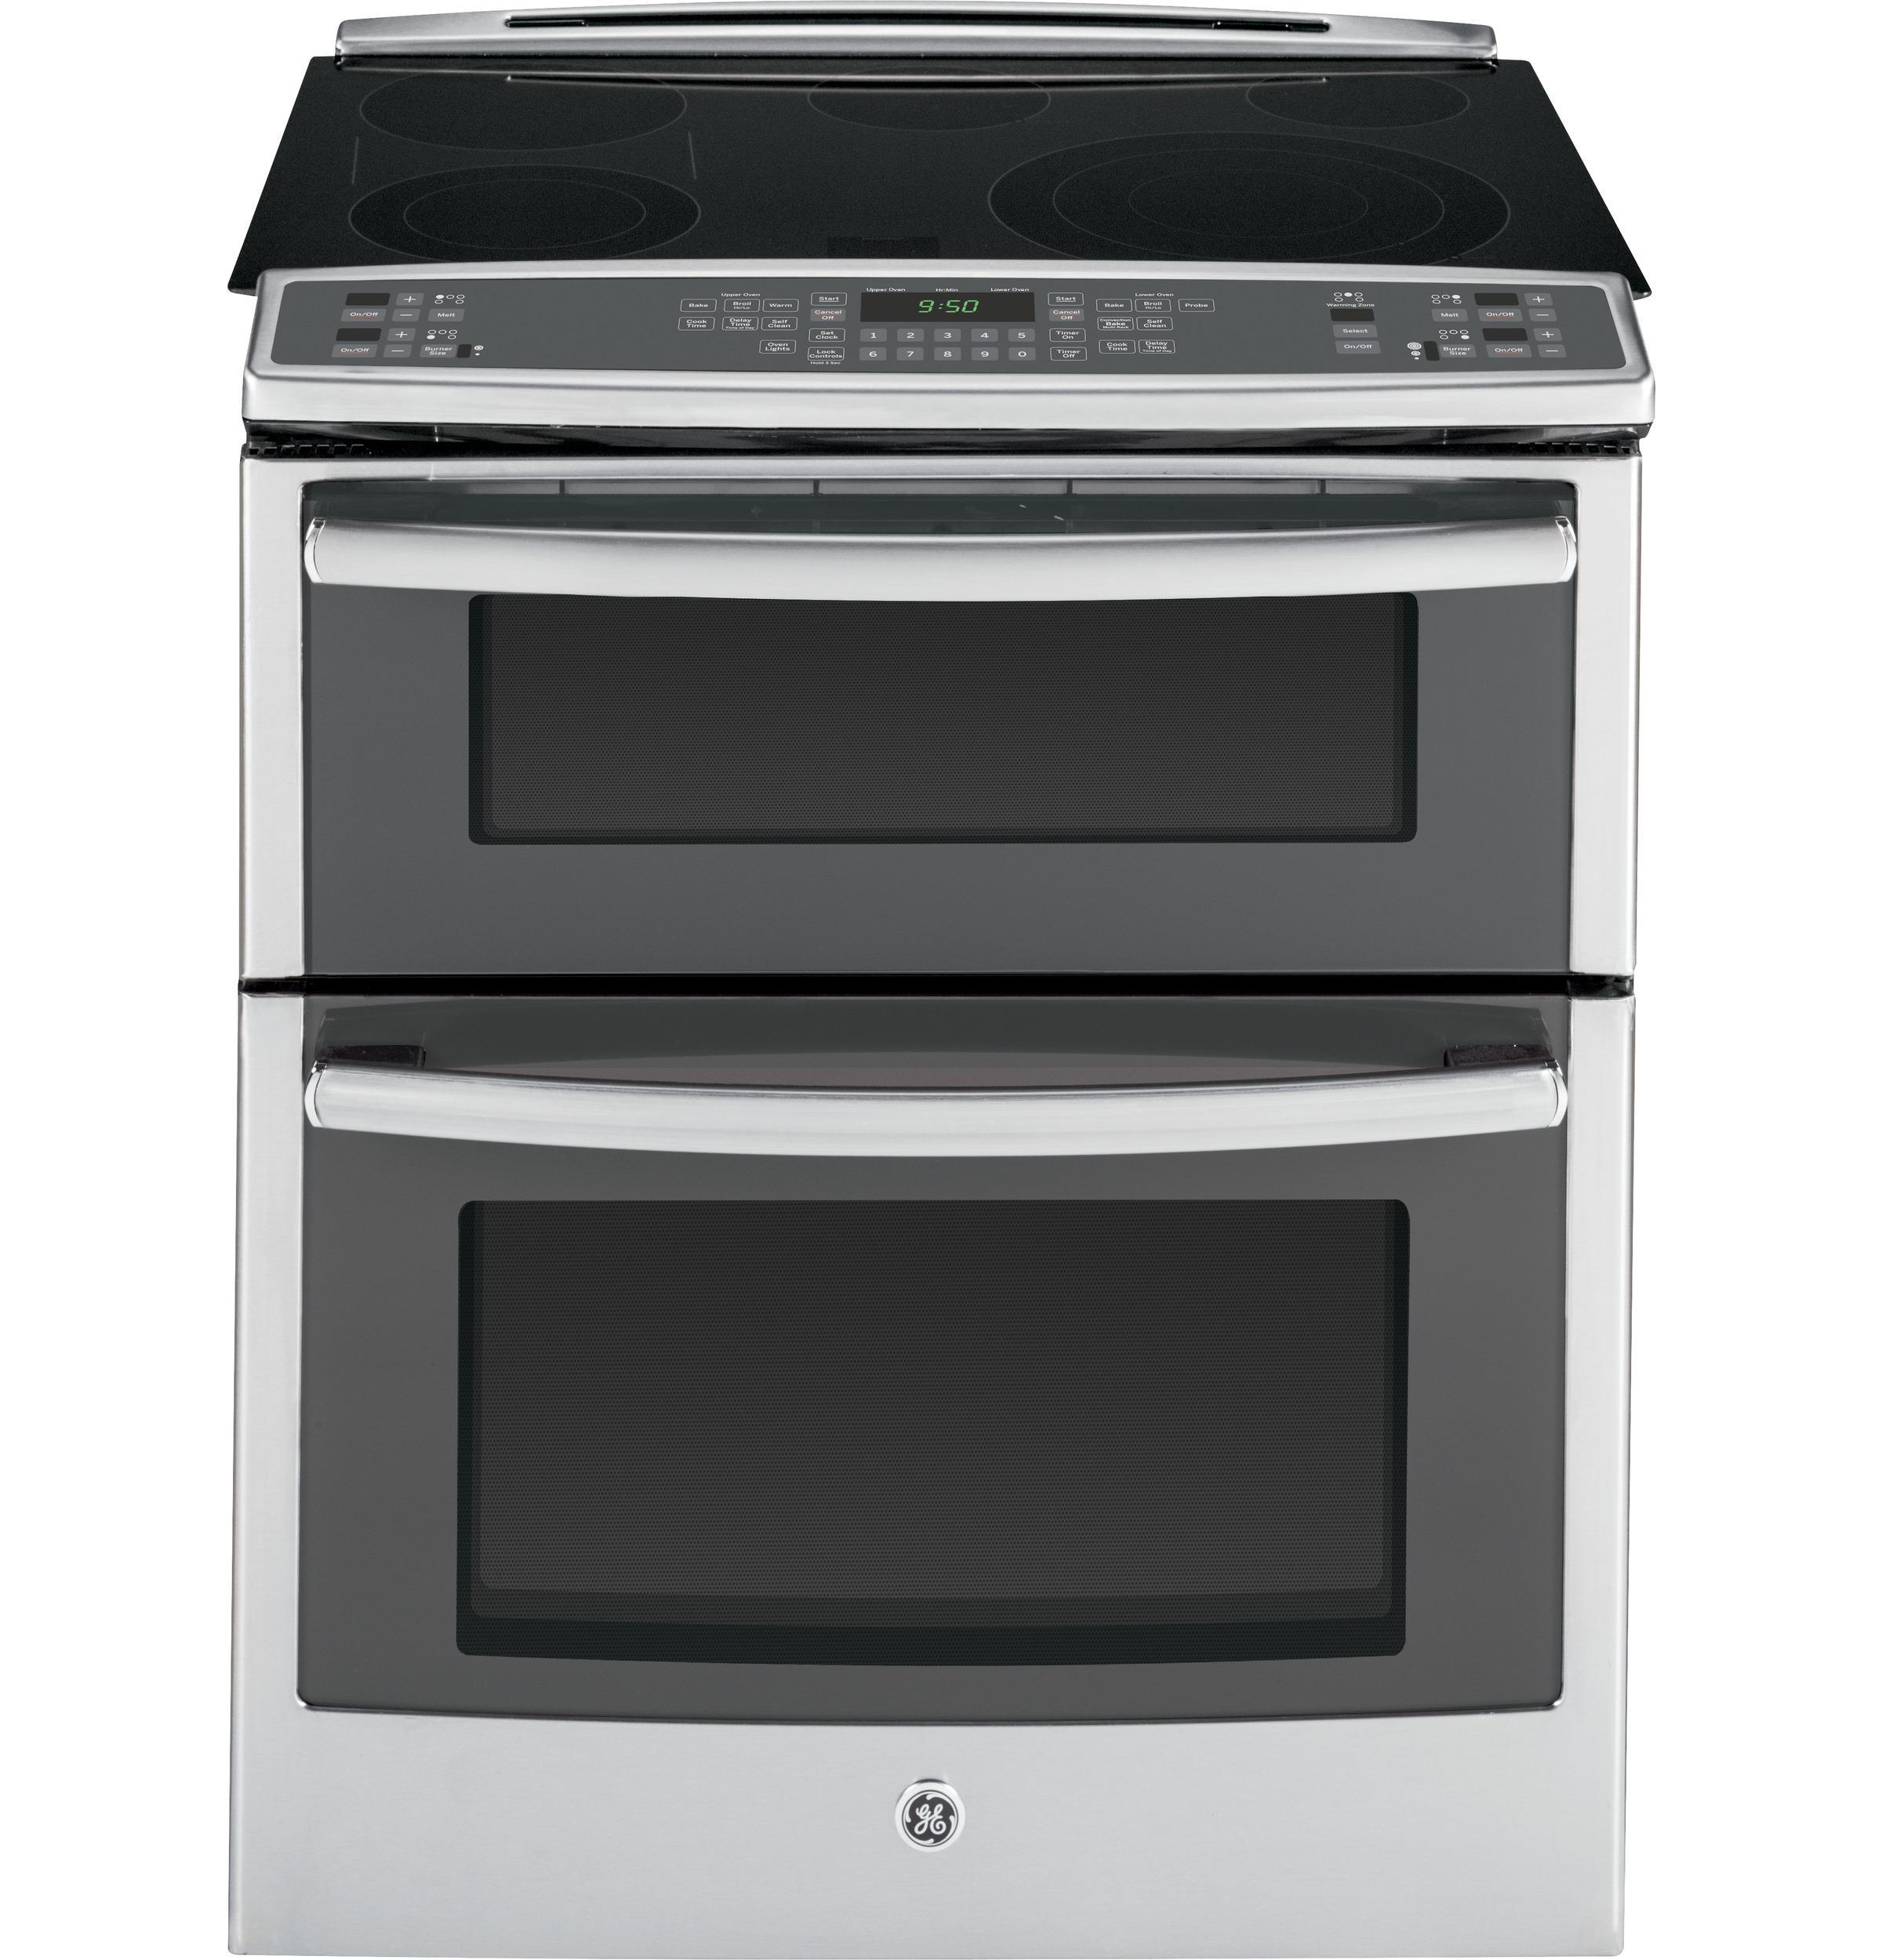 "GE Appliances Electric Range 30"" Slide-In Double Range - Item Number: PS950SFSS"